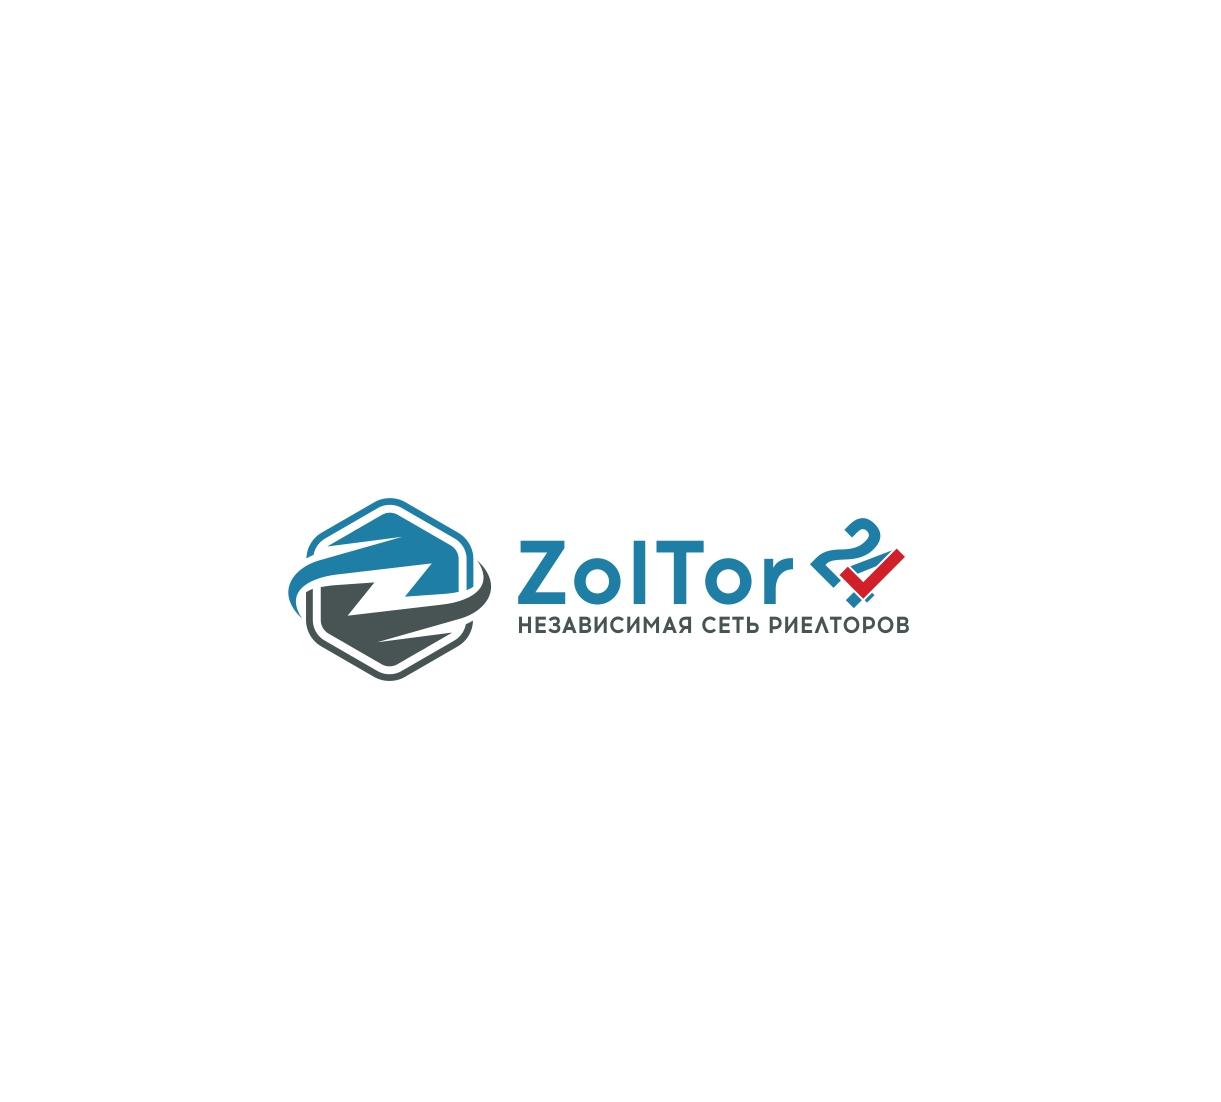 Логотип и фирменный стиль ZolTor24 фото f_4255c8a377f572a6.jpg